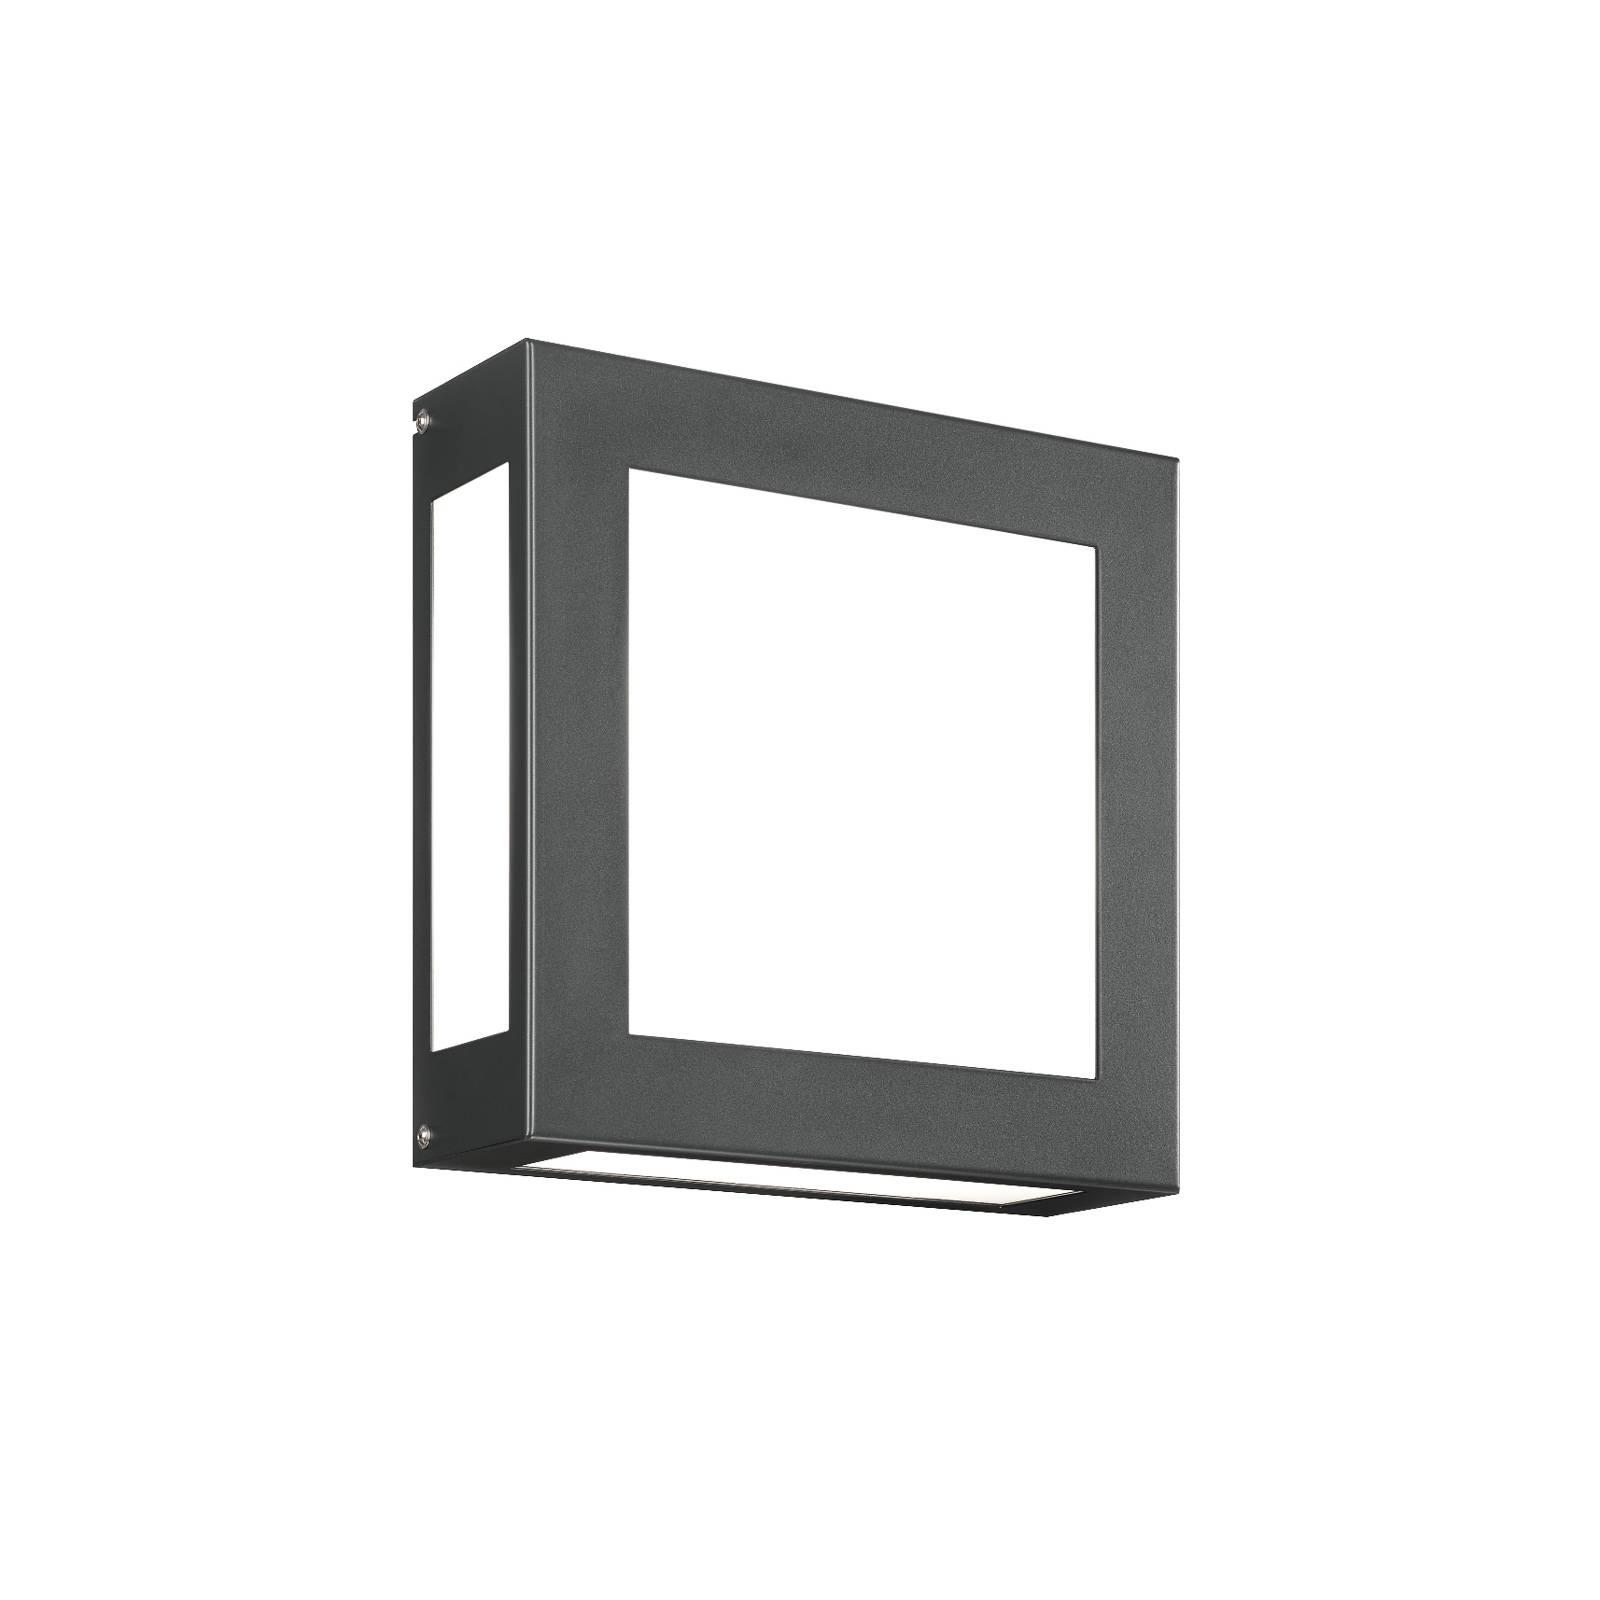 LED-Außenwandleuchte Aqua Legendo, anthrazit